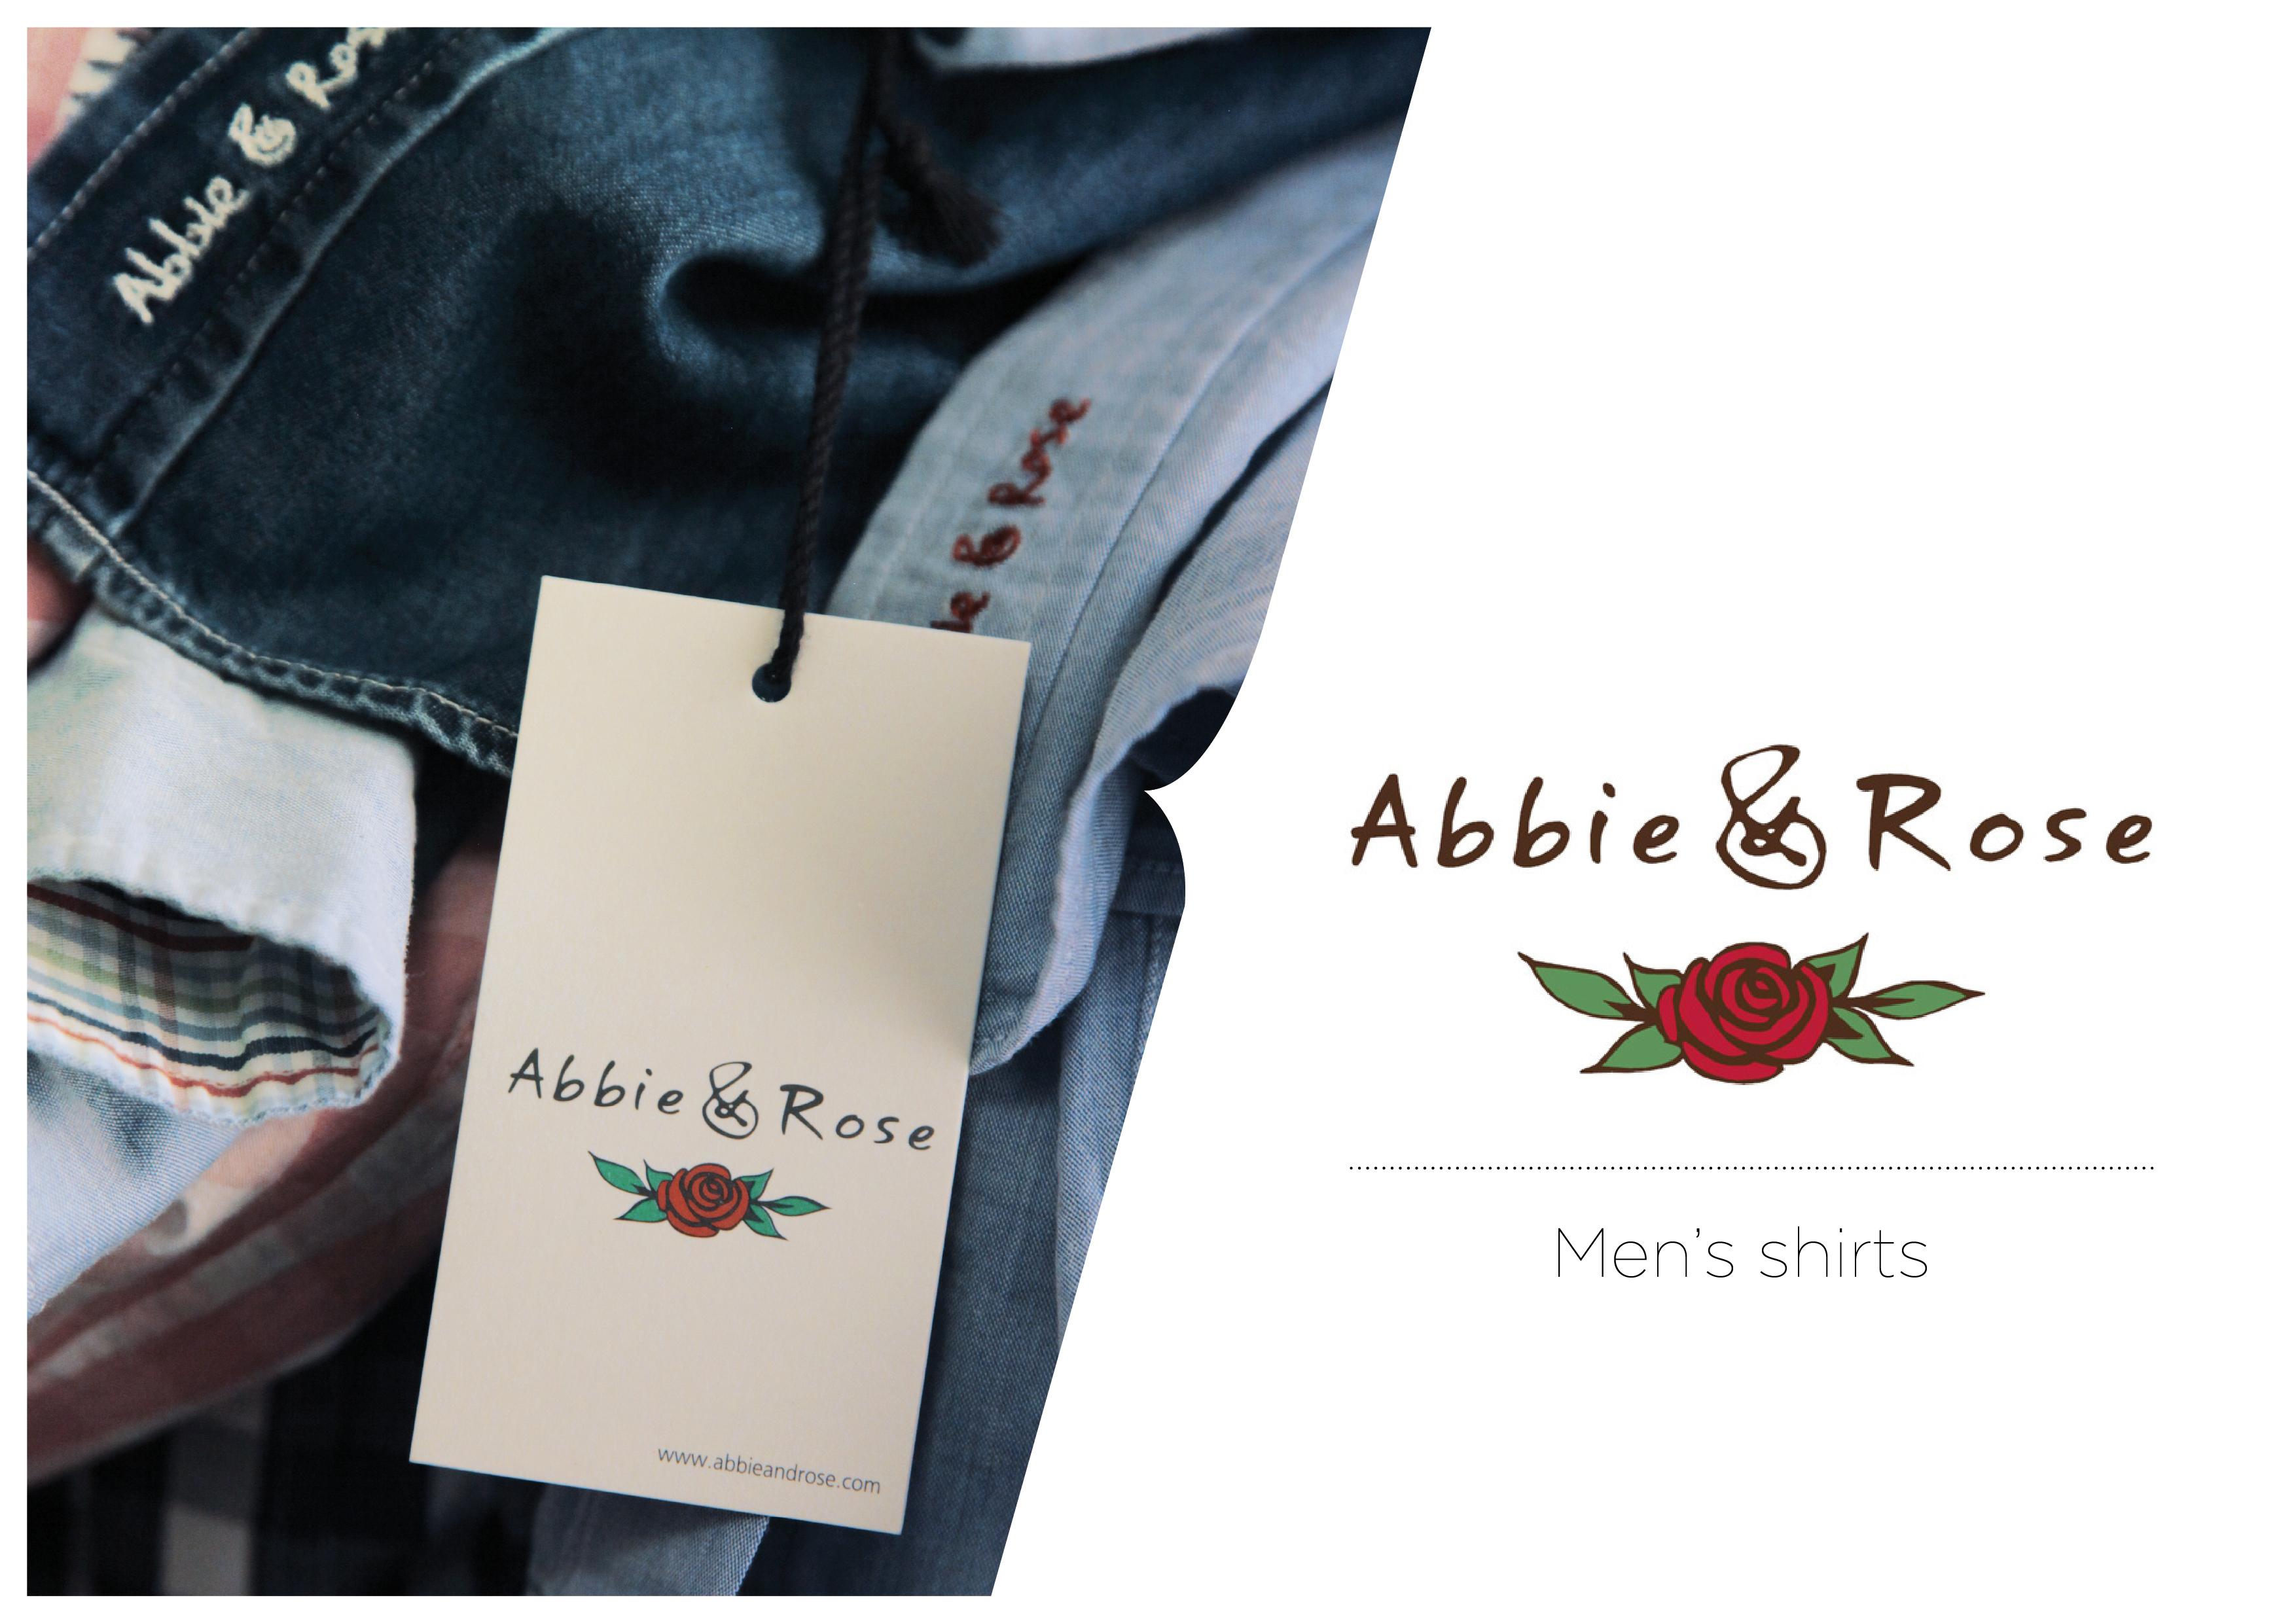 AbbieAndRose-Men's Shirts-FR